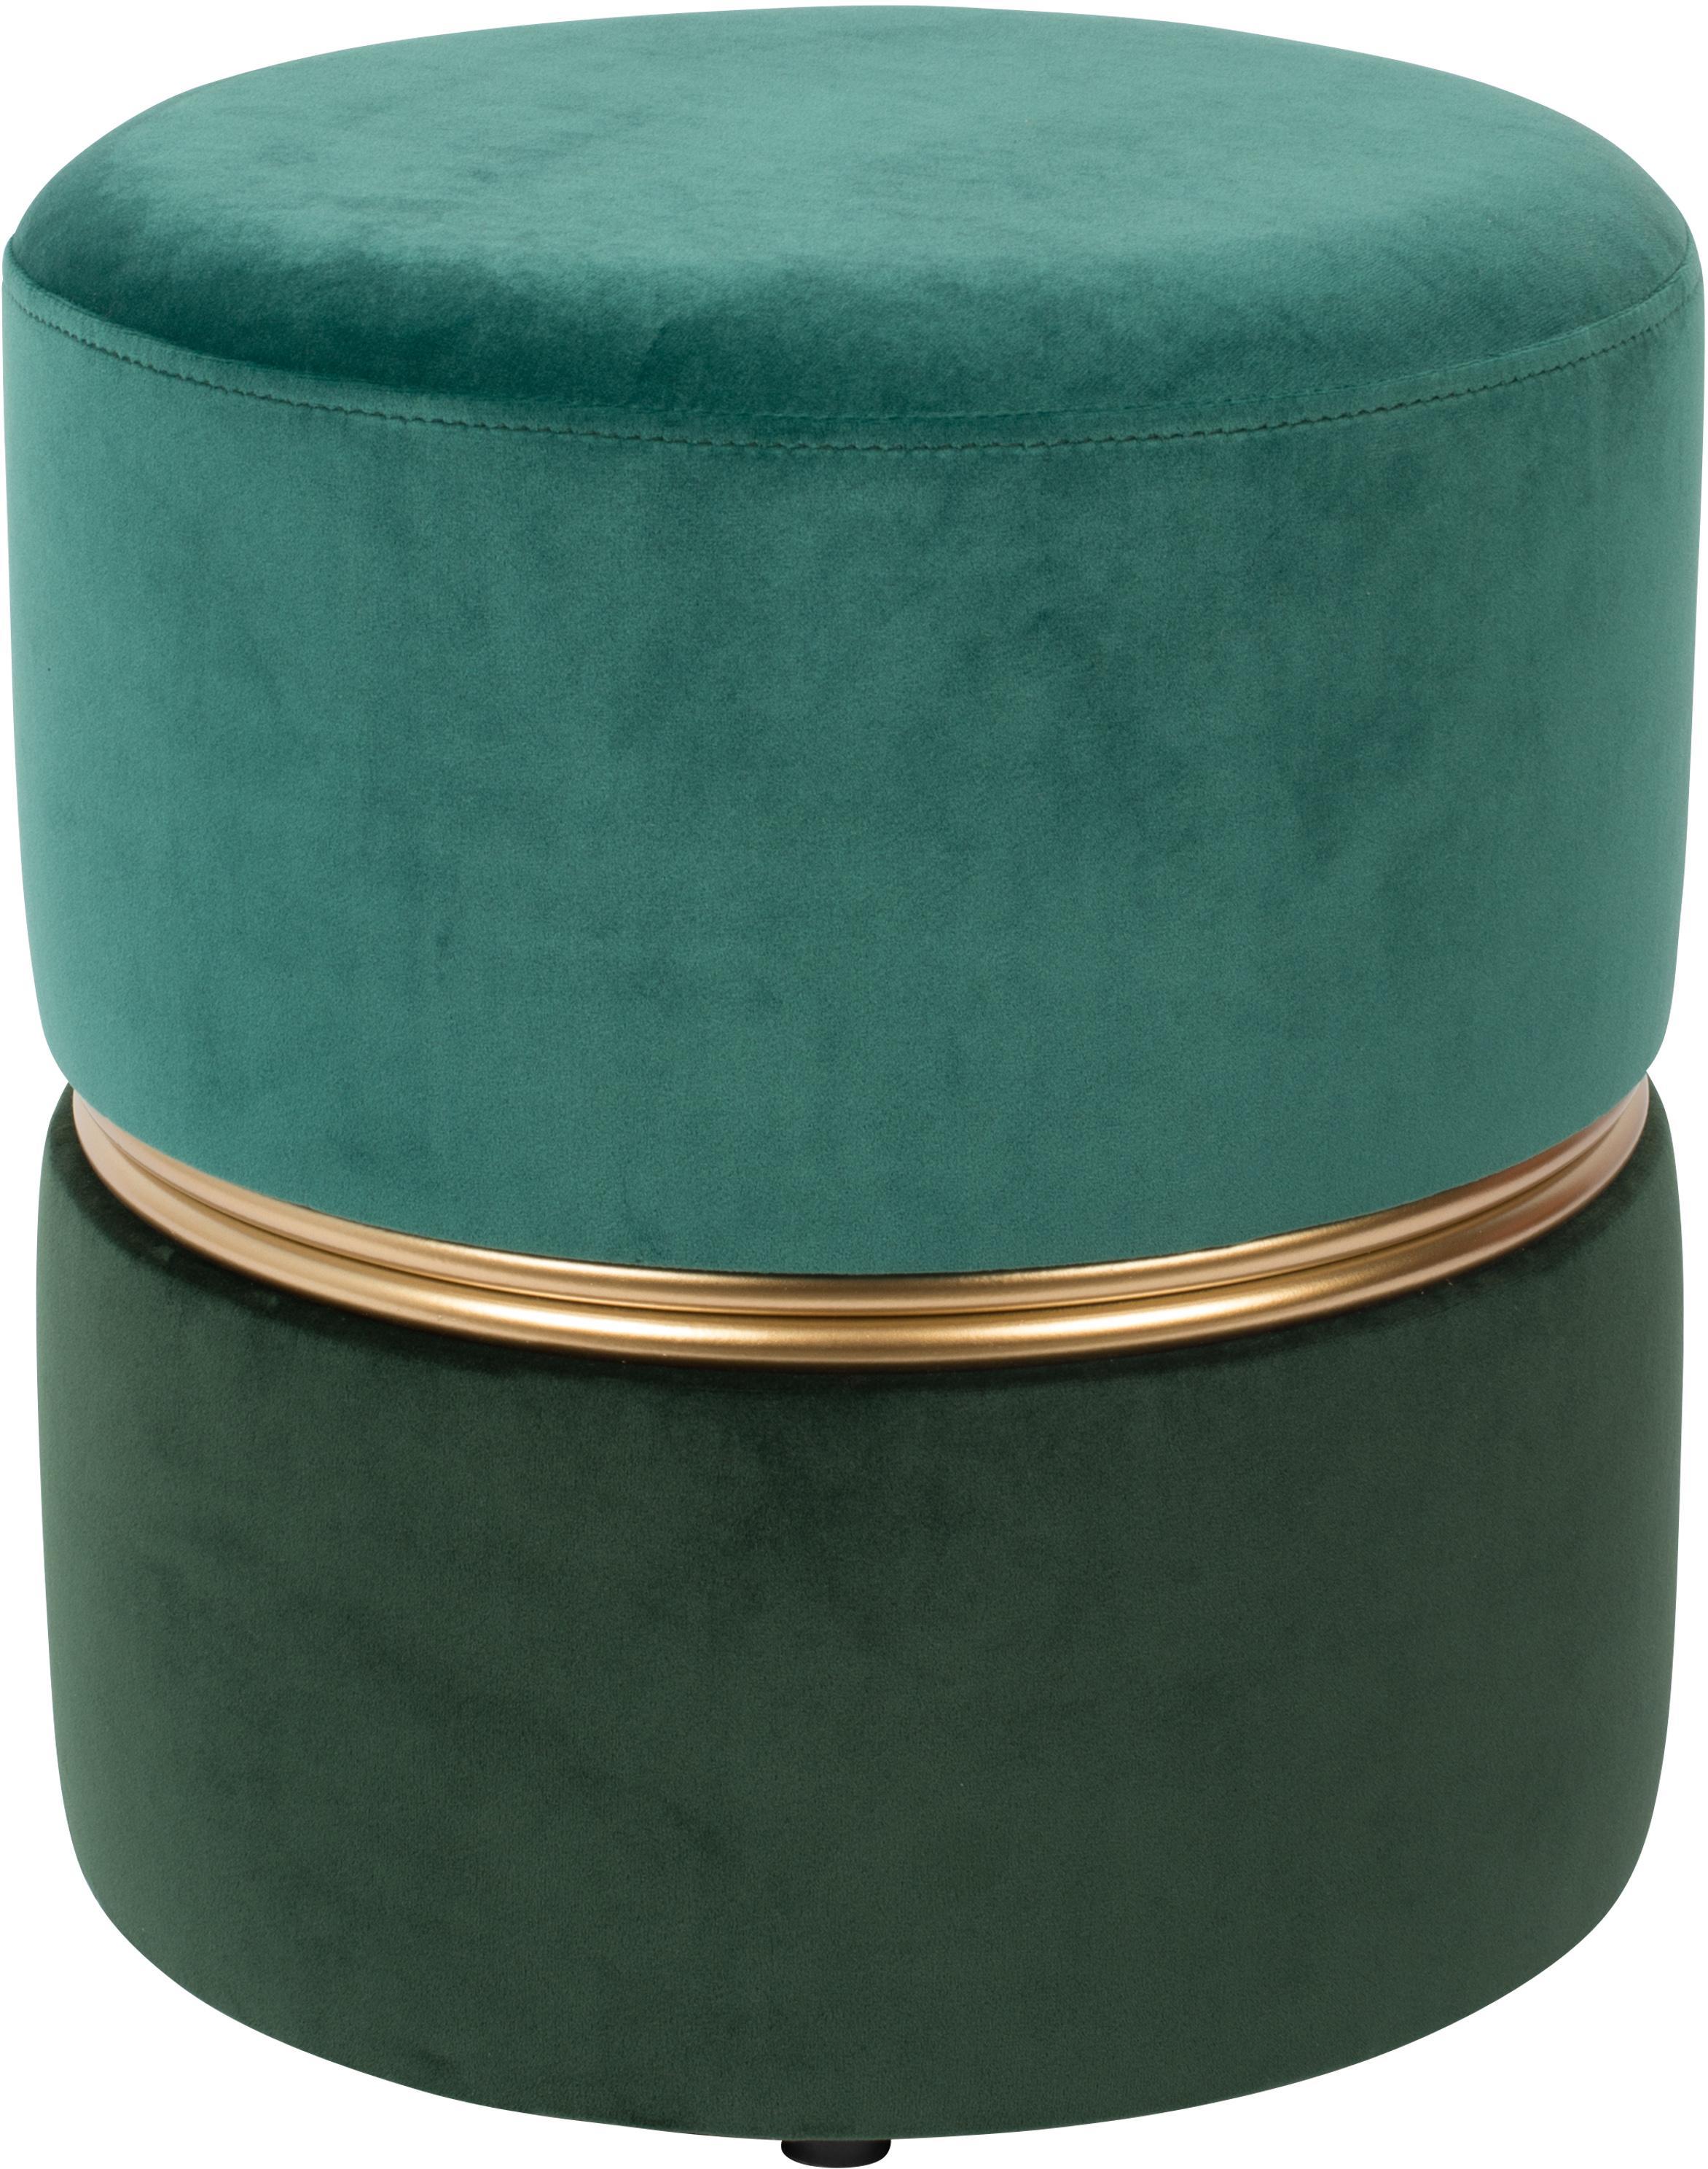 Puf de terciopelo Bubbly, Tapizado: terciopelo de poliéster 2, Estructura: tablero de fibra de densi, Tonos verdes, Ø 35 x Al 39 cm